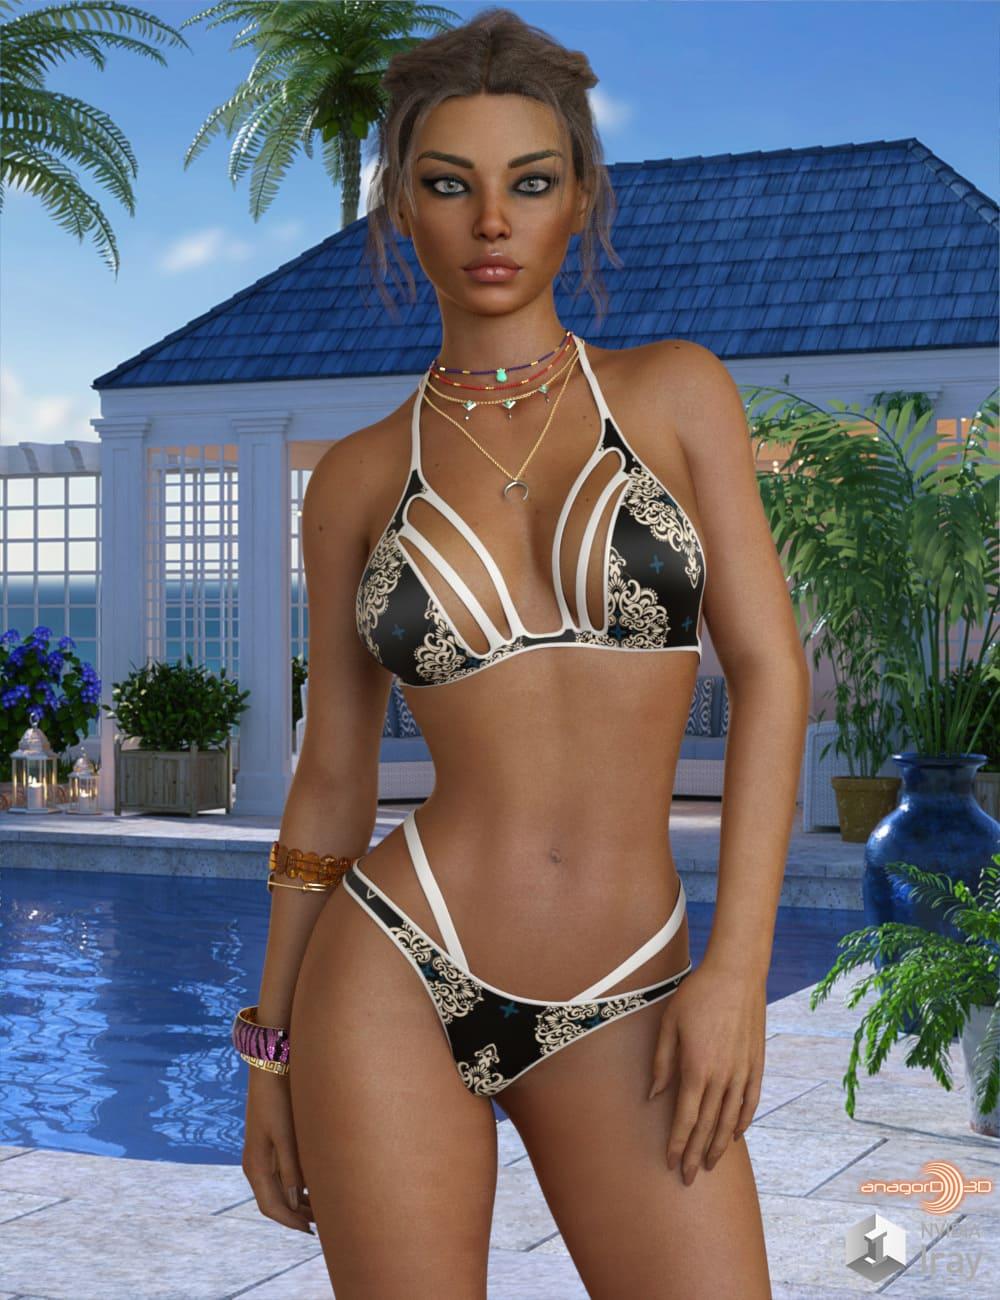 VERSUS – Candid Bikini for Genesis 8 Females_DAZ3D下载站